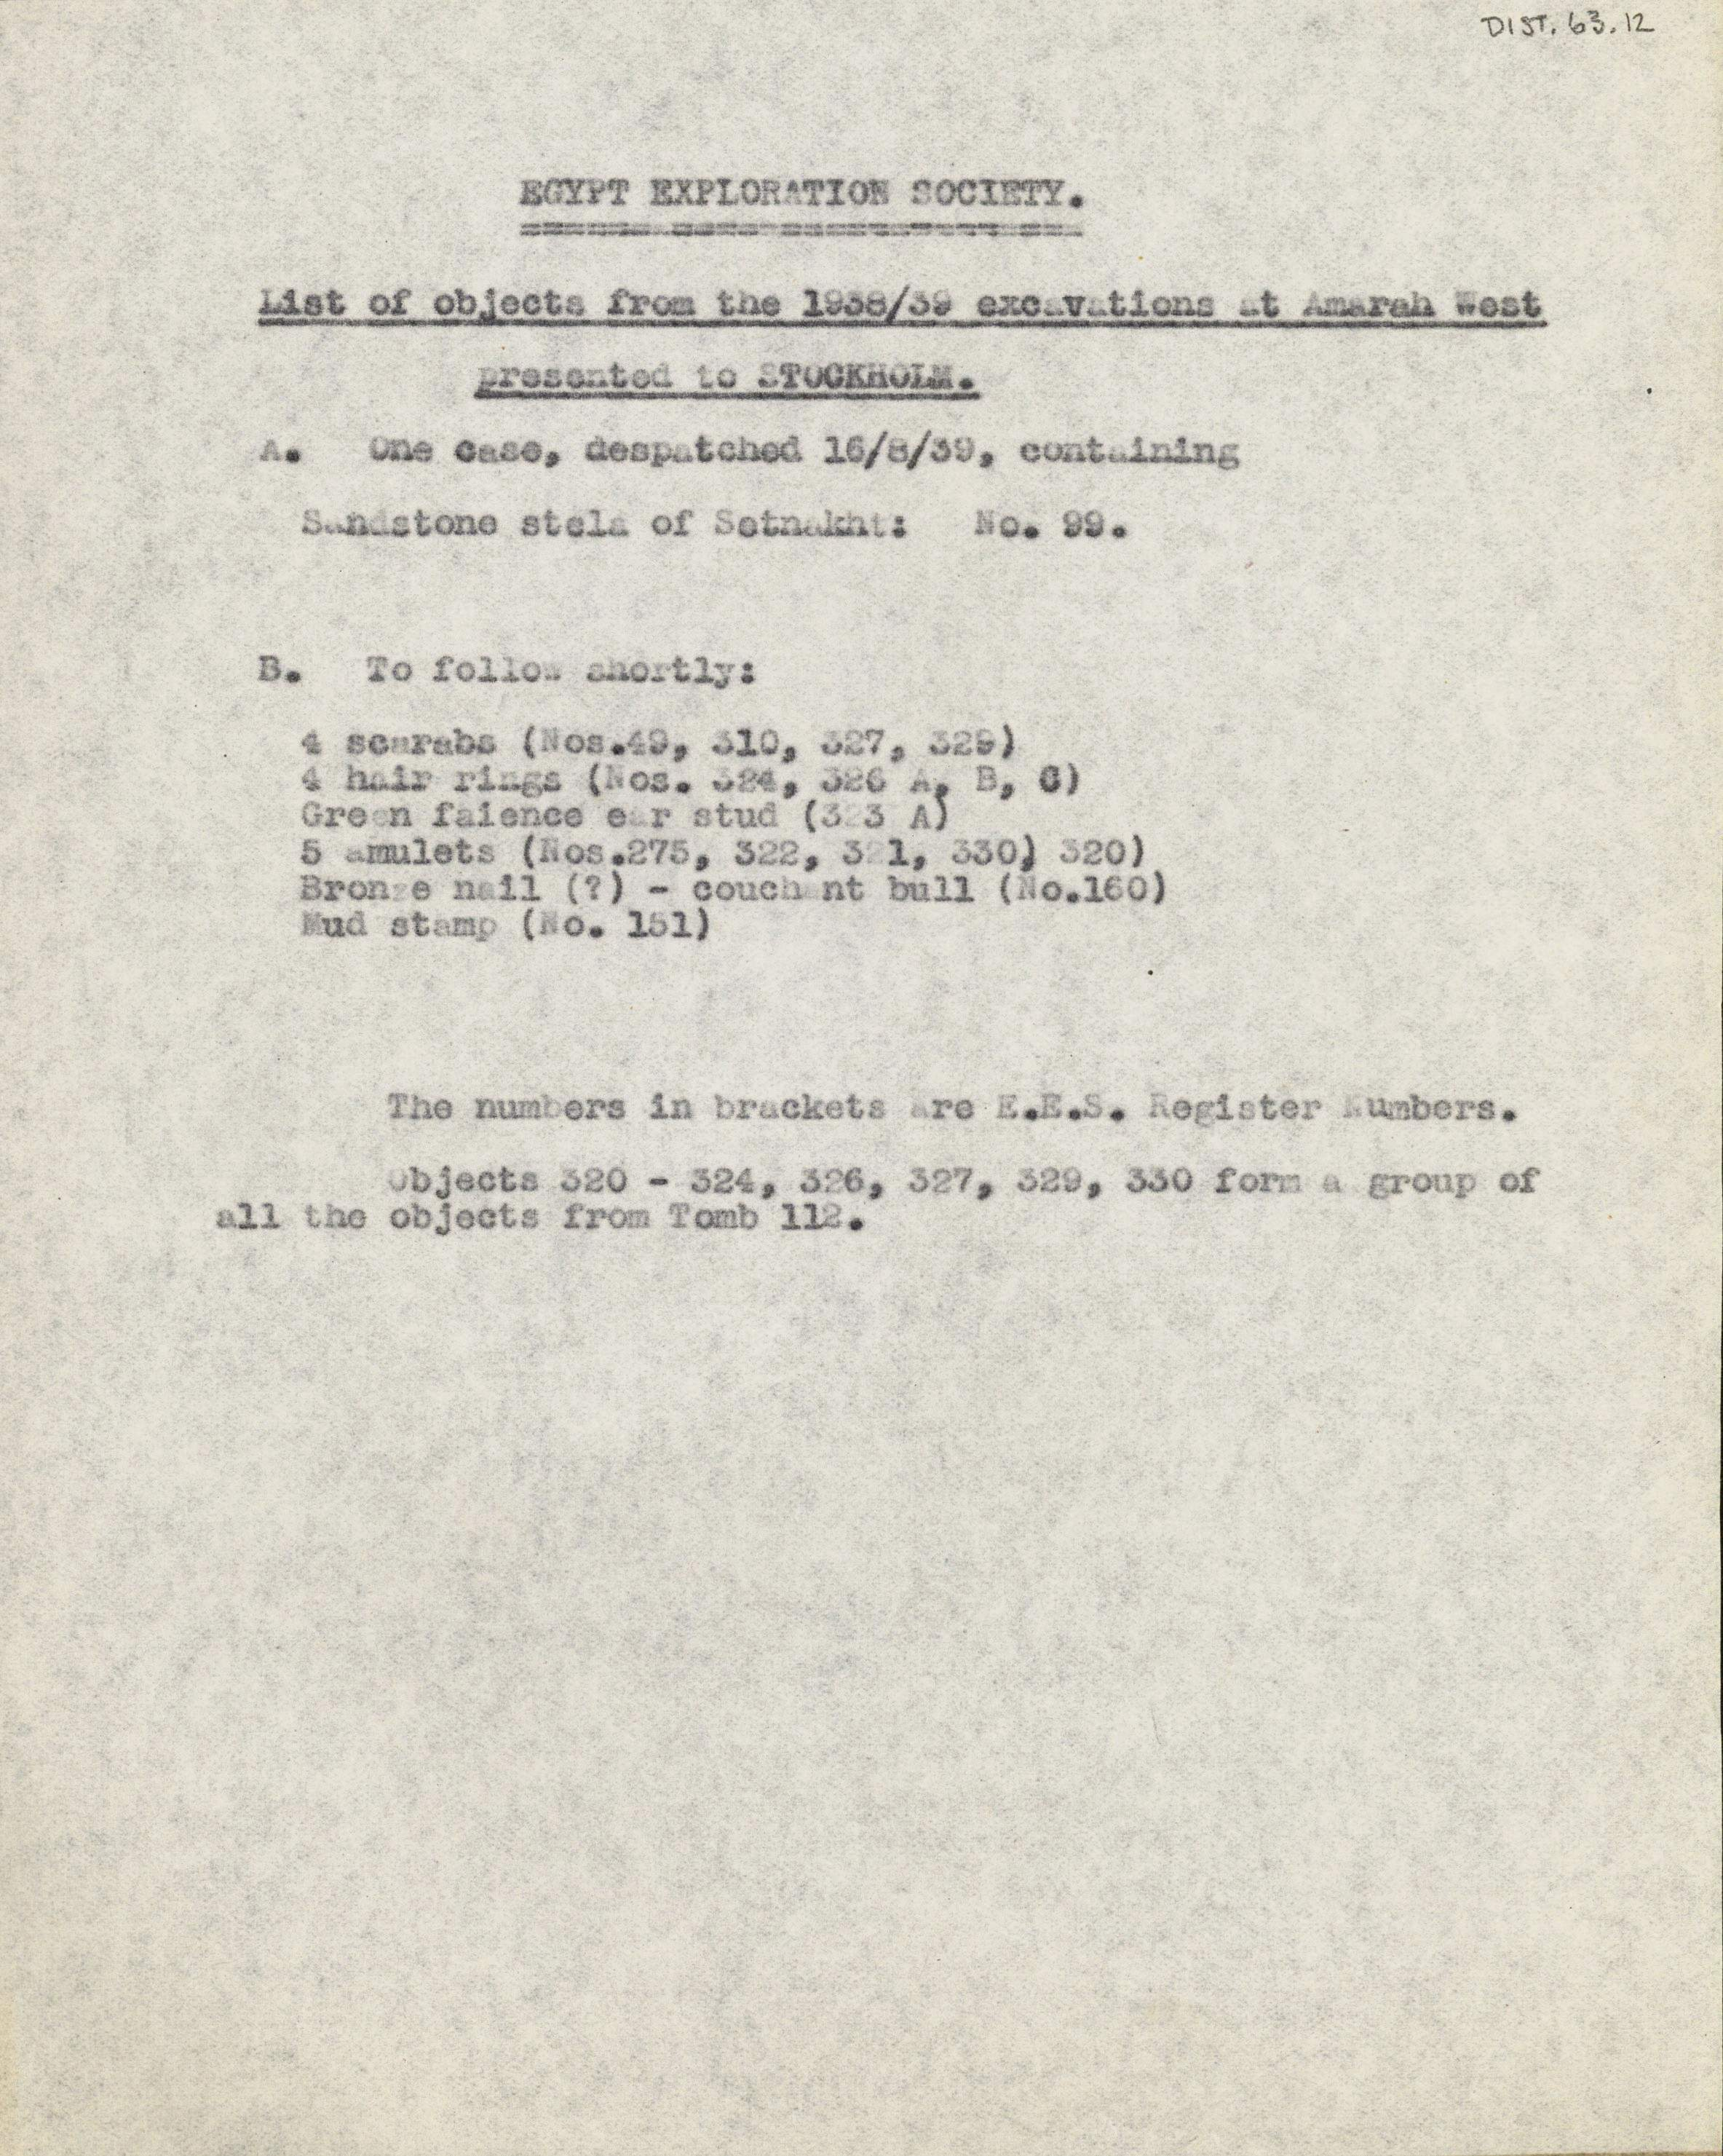 1936-39 Amarah West, Sesebi DIST.63.12